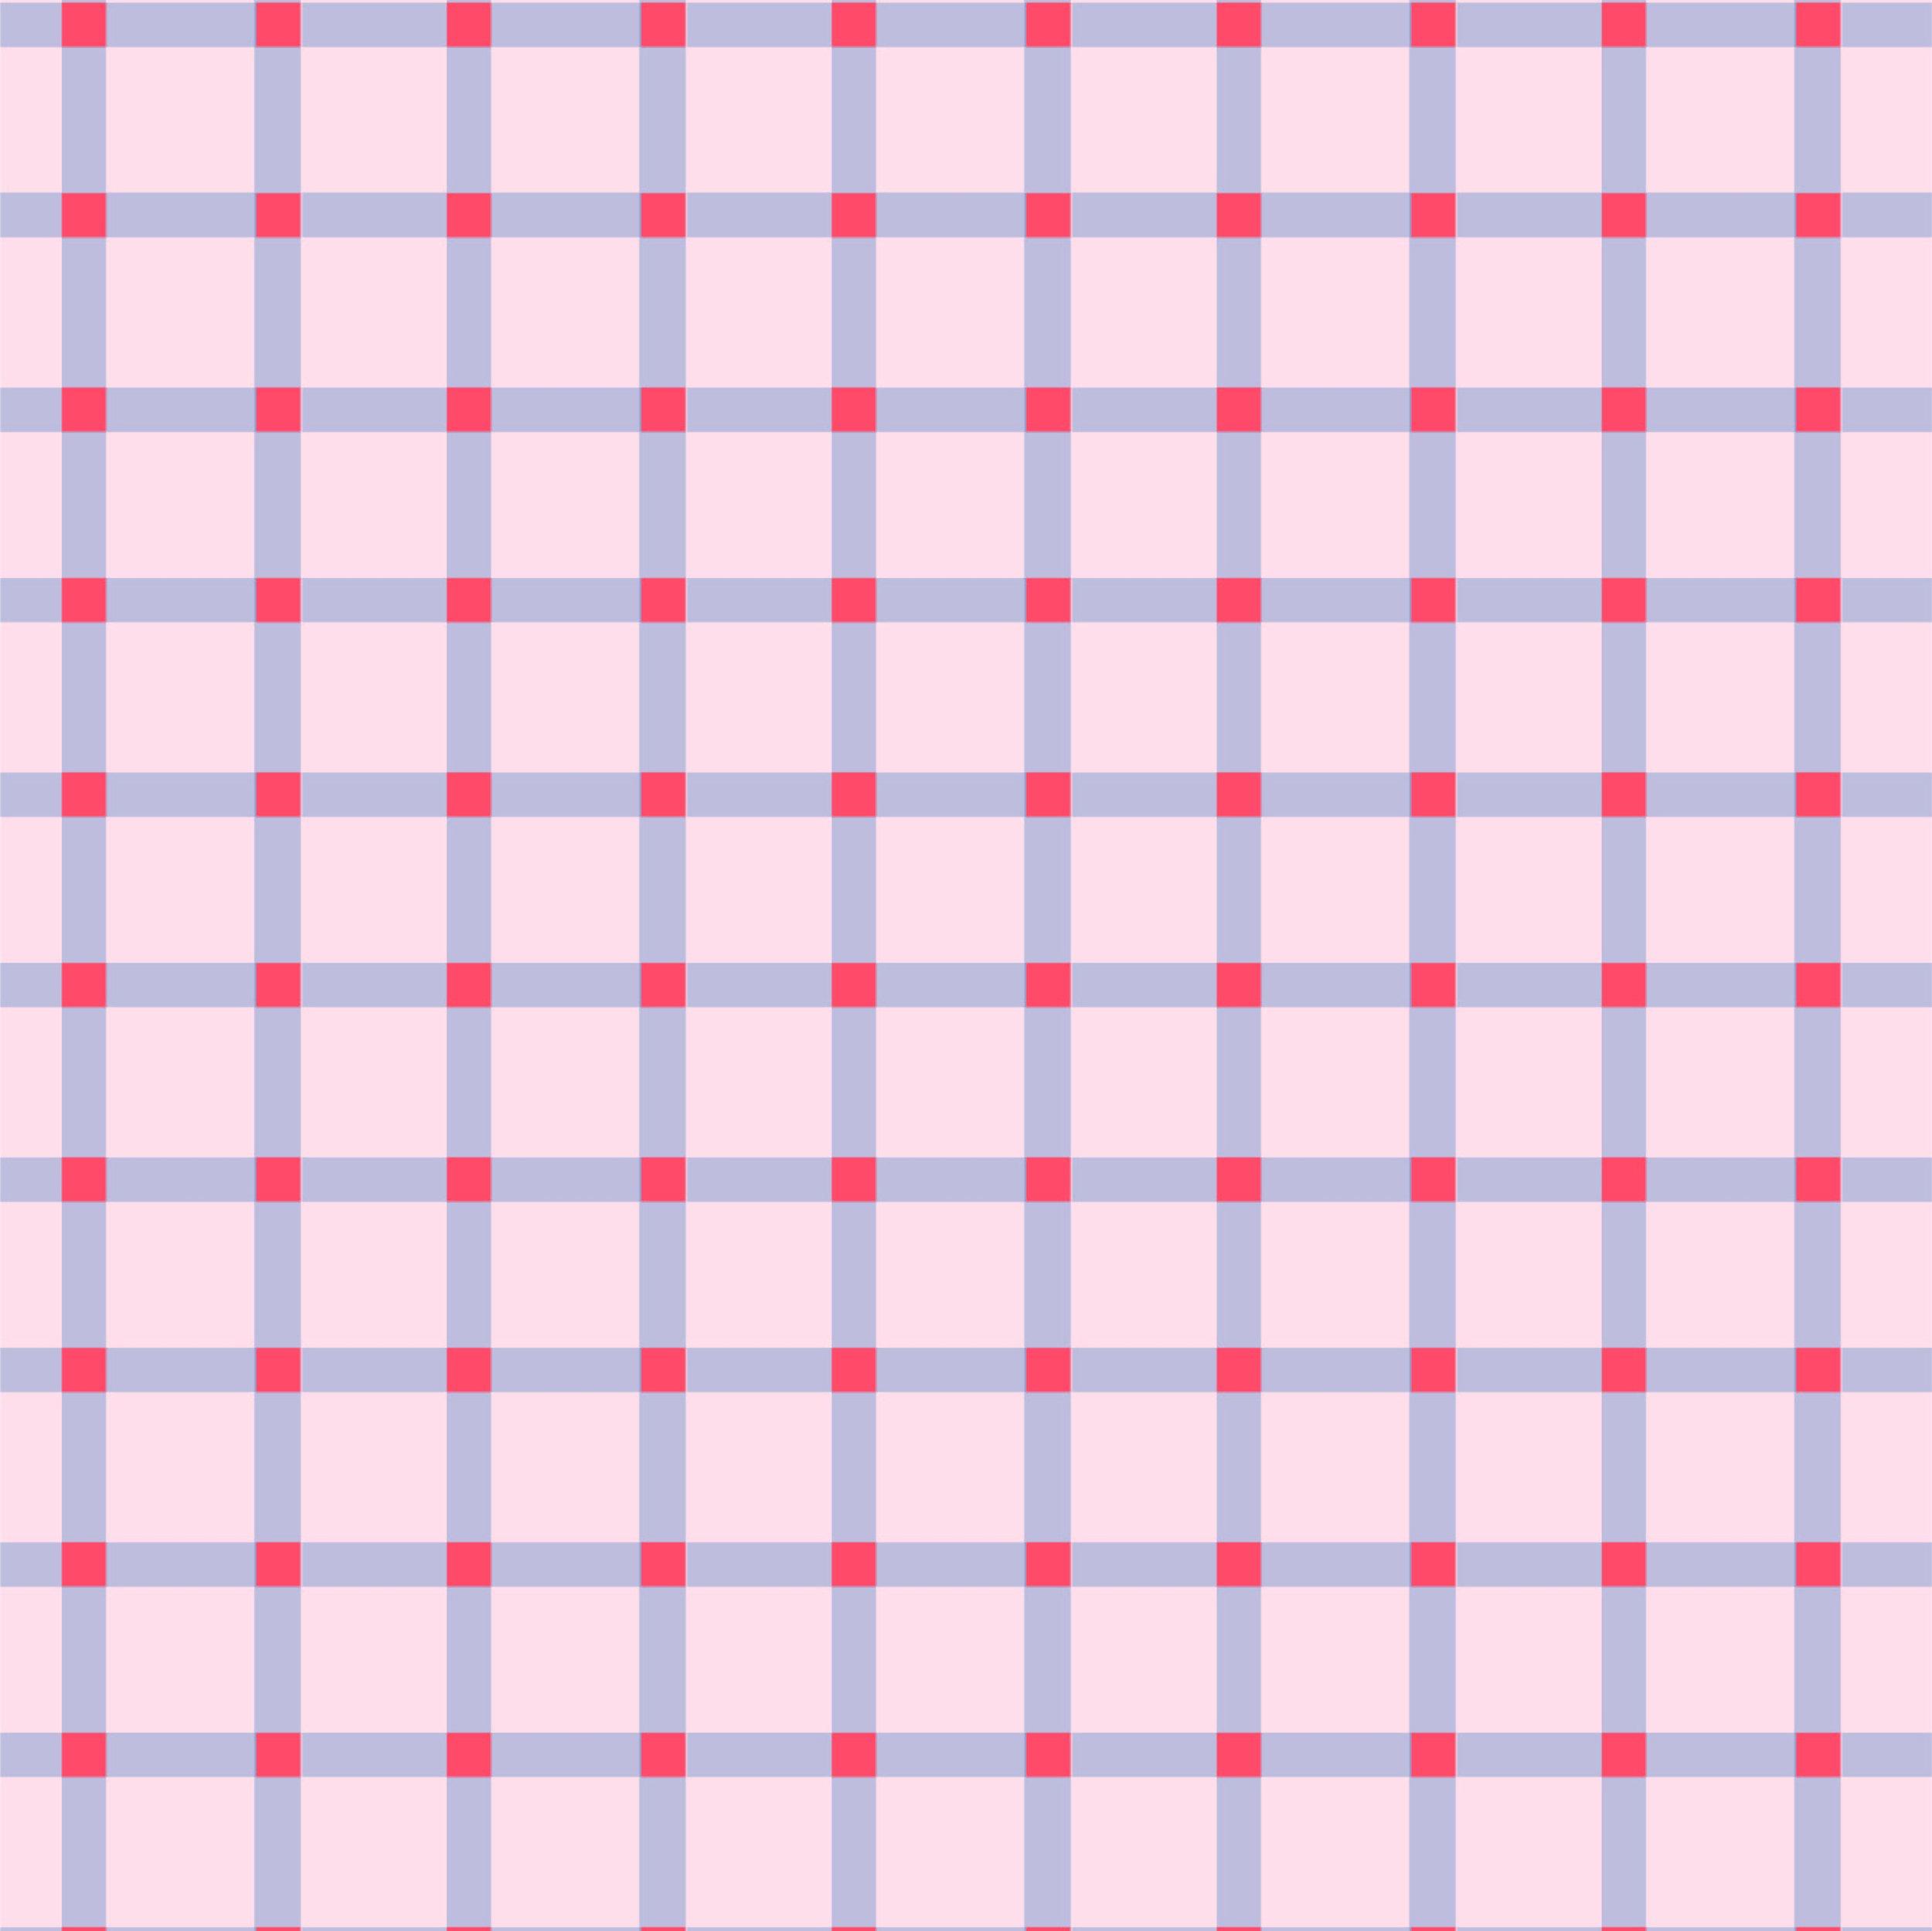 patterns for texas-05.jpg